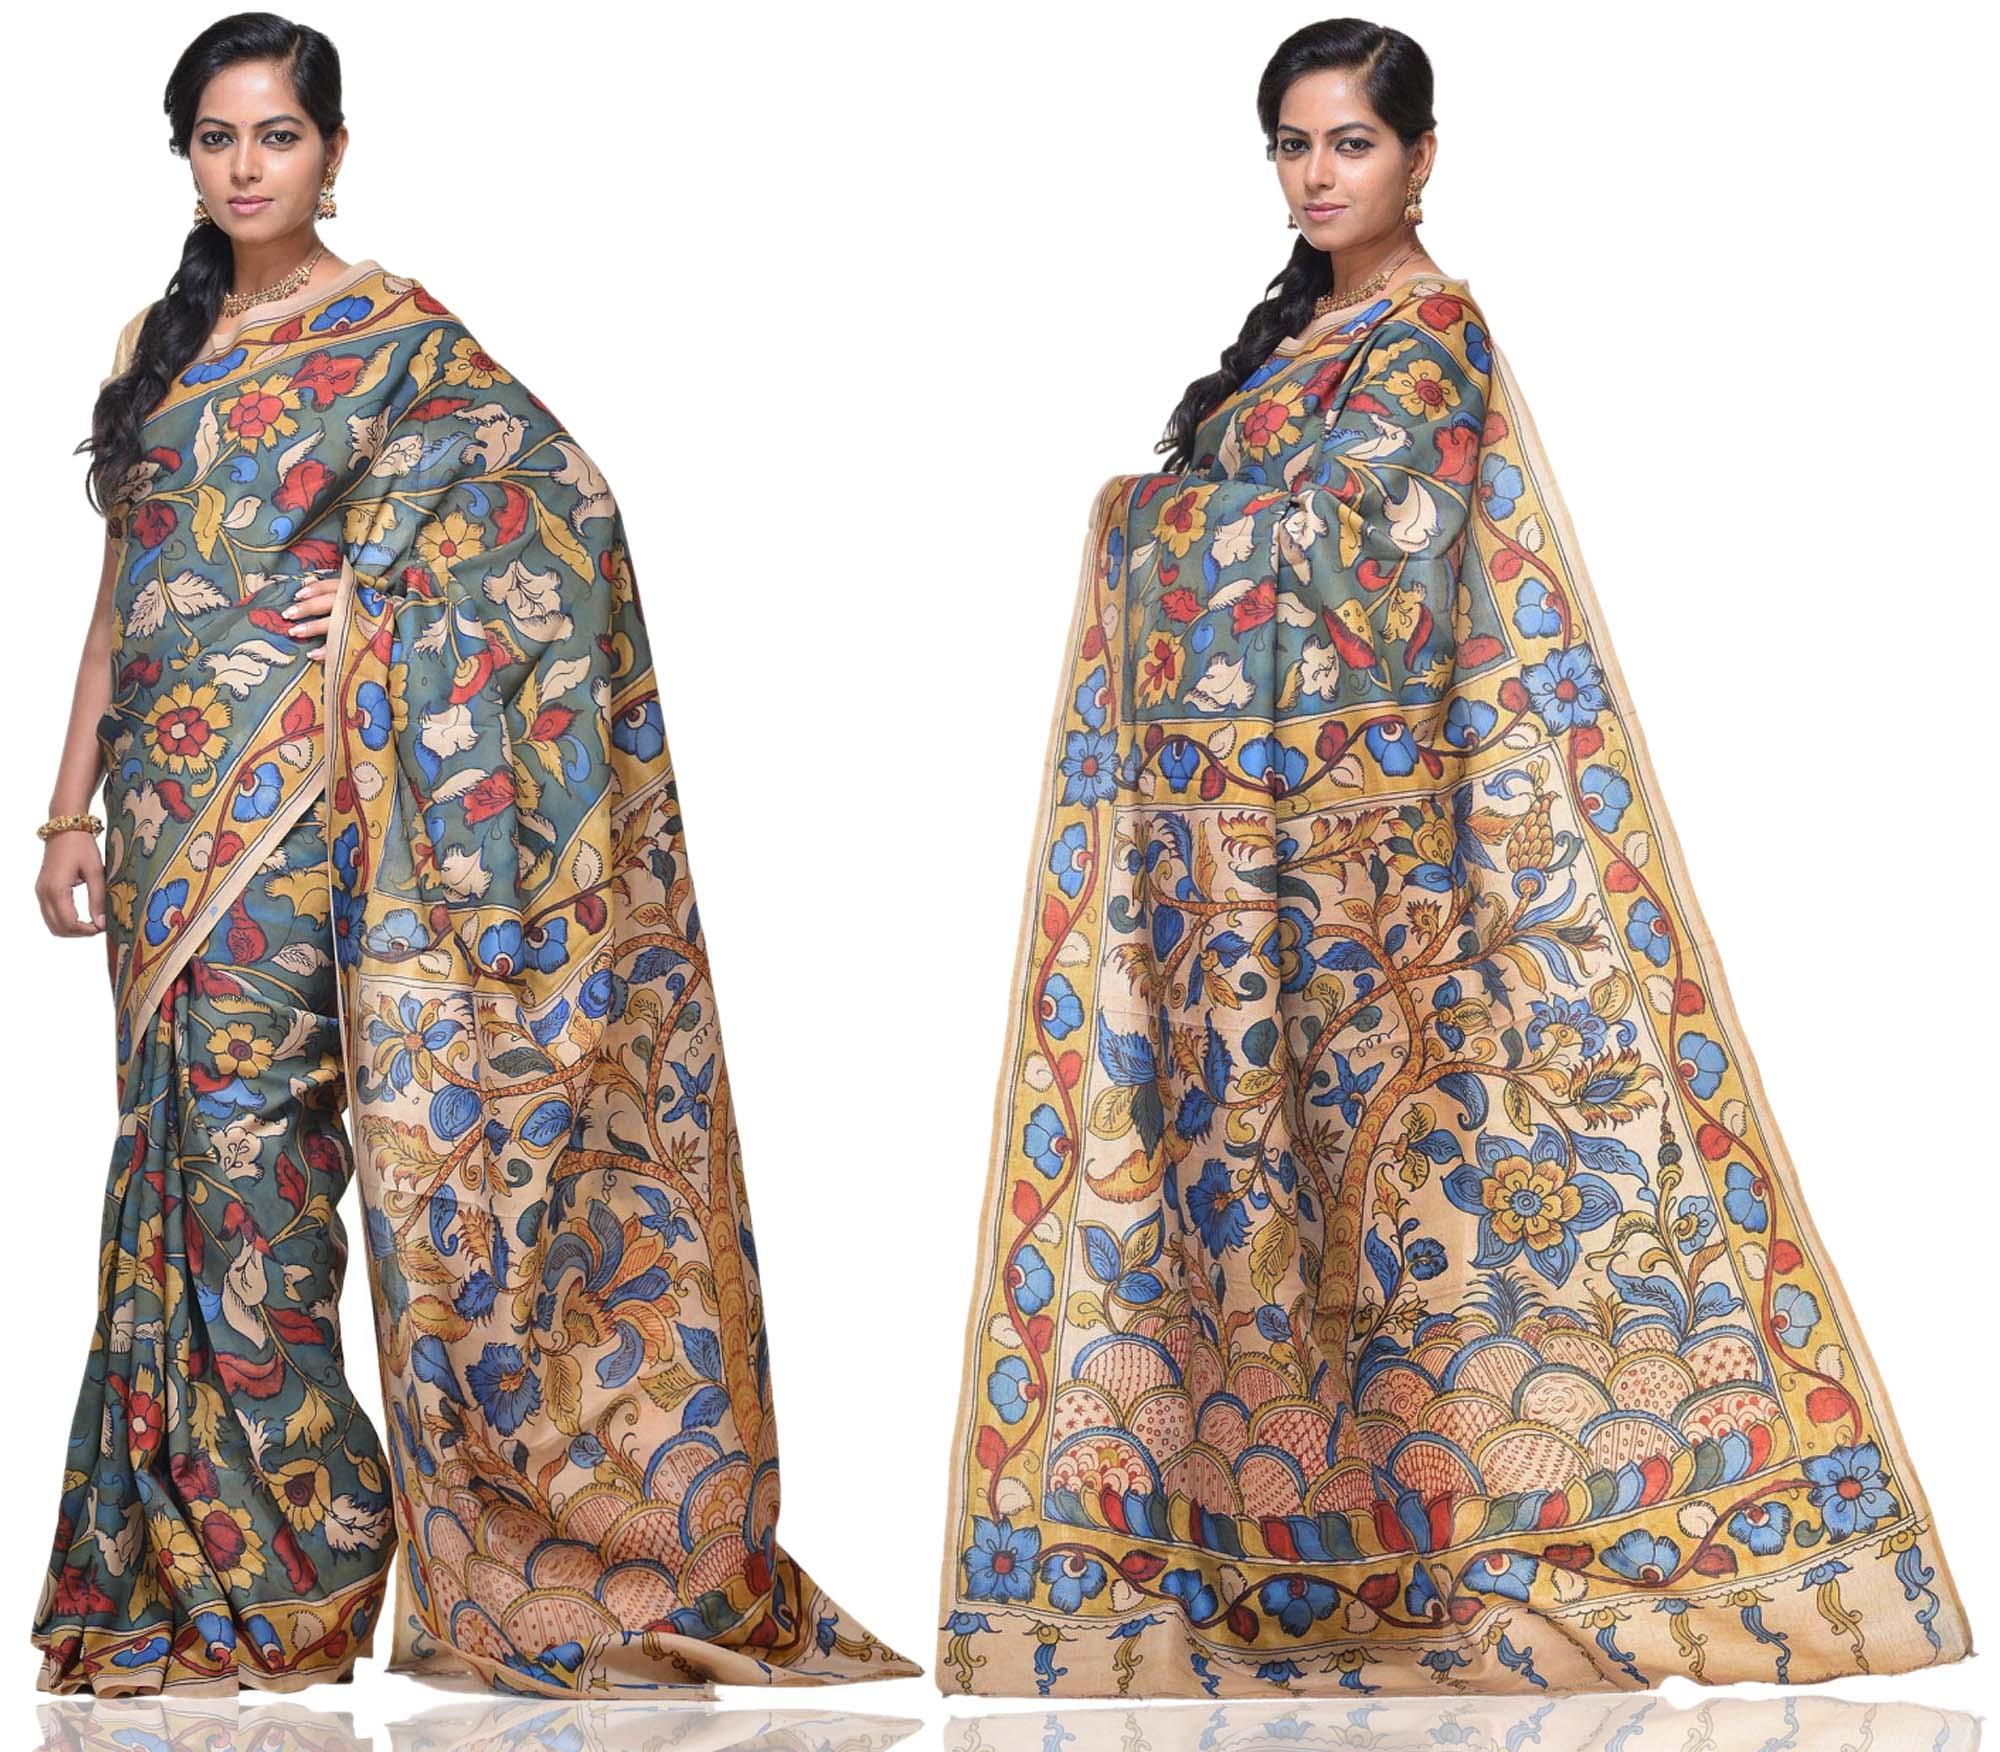 Price: - 15000 /-   New collections of Kalamkari sarees, kalamkari silk sarees, kalamkari cotton sarees, kalamkari cotton dress material, Kalamkari sarees. Sign up now for E-book you will be updated with latest collection of ethnic verities. For More Info Click on :- www.uppada.com  We manufacture of Uppada sarees, Paithani sarees, Banarasi sarees, Venkatagiri Sarees, Gadwal Sarees, Khadi sarees, Hand Painted Kalamkari Dupatta, Ikkat sarees, Kanchipuram Sarees, Atr Poly Silk Sarees, Dupattas, Stoles etc. For more info us at 040 64640303, 441905005.  Buy online: - uppada.com  - by Paithani, Hyderabad